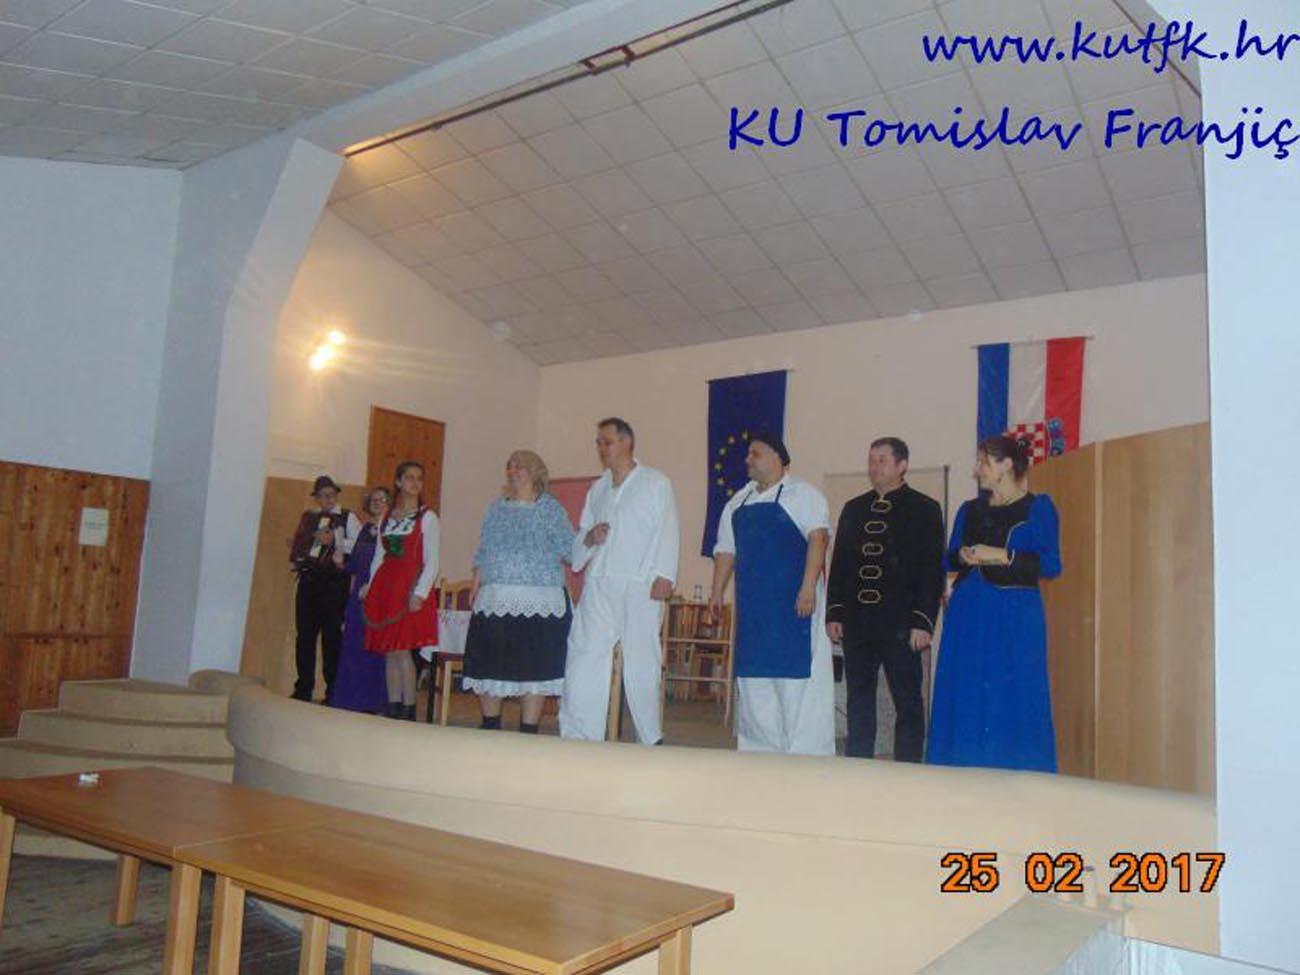 LokalnaHrvatska.hr Kalinovac Predstava Na konaku gostovala u Podravskim Sesvetama